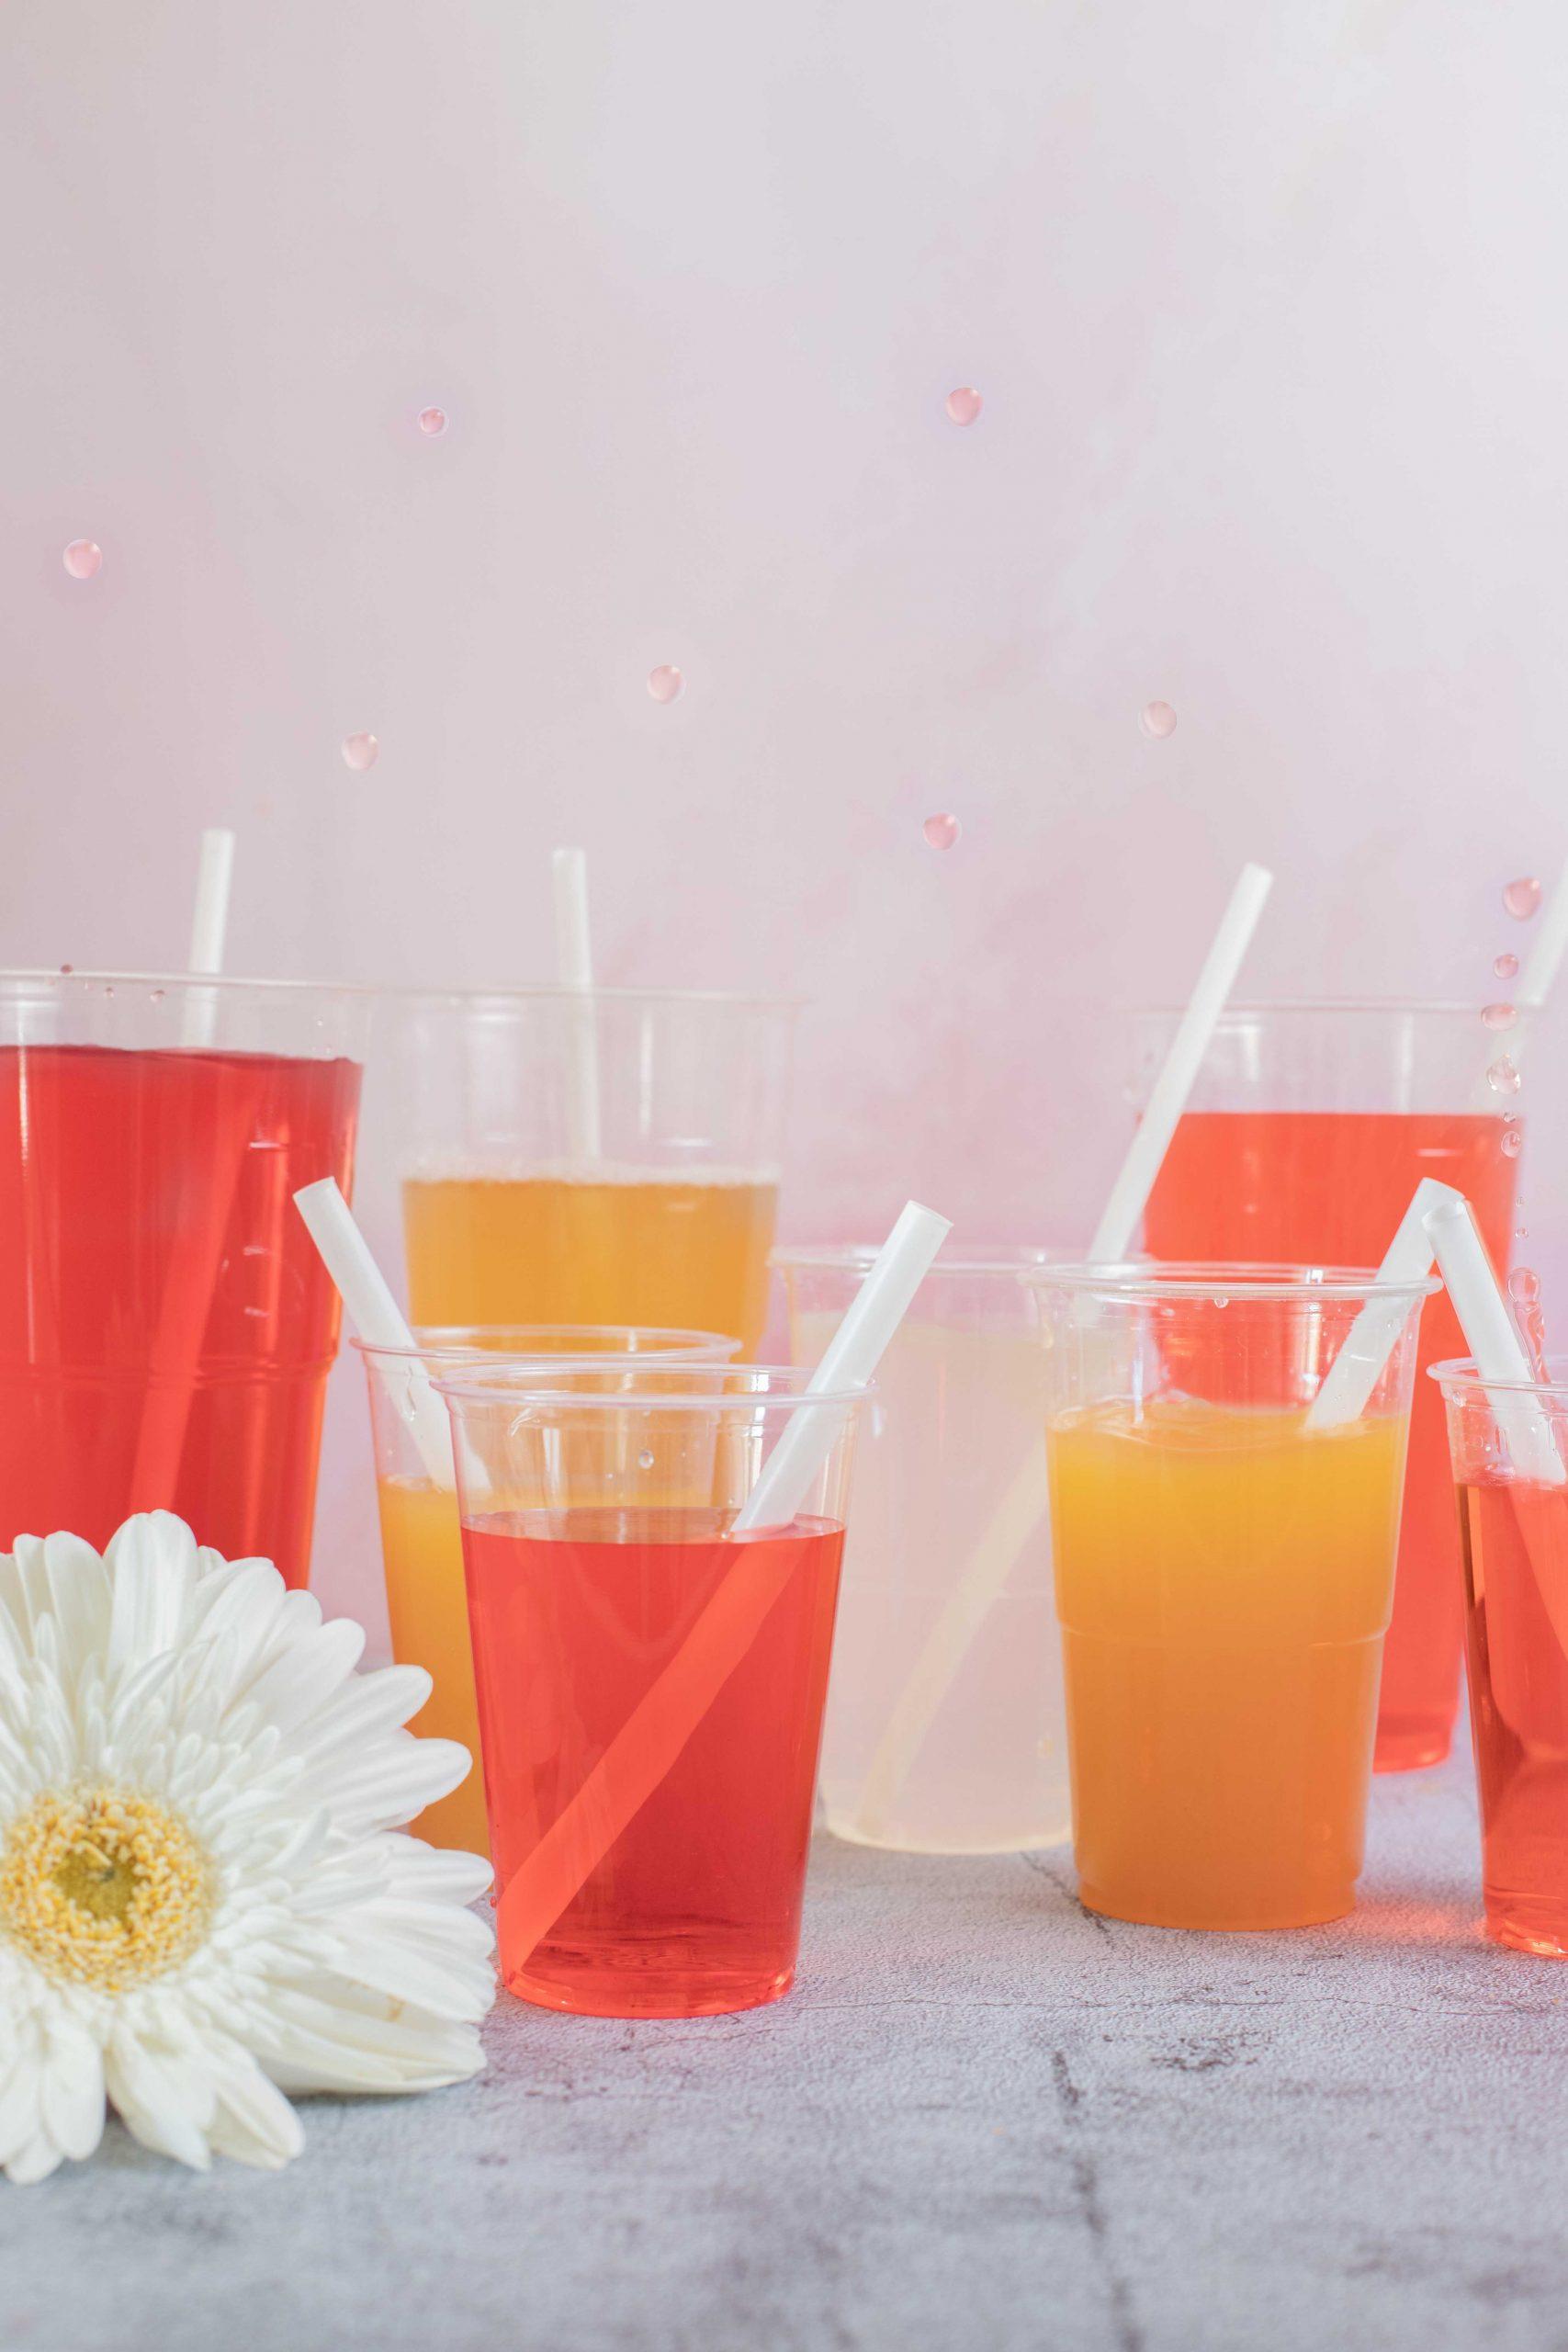 verres jetables ecologique